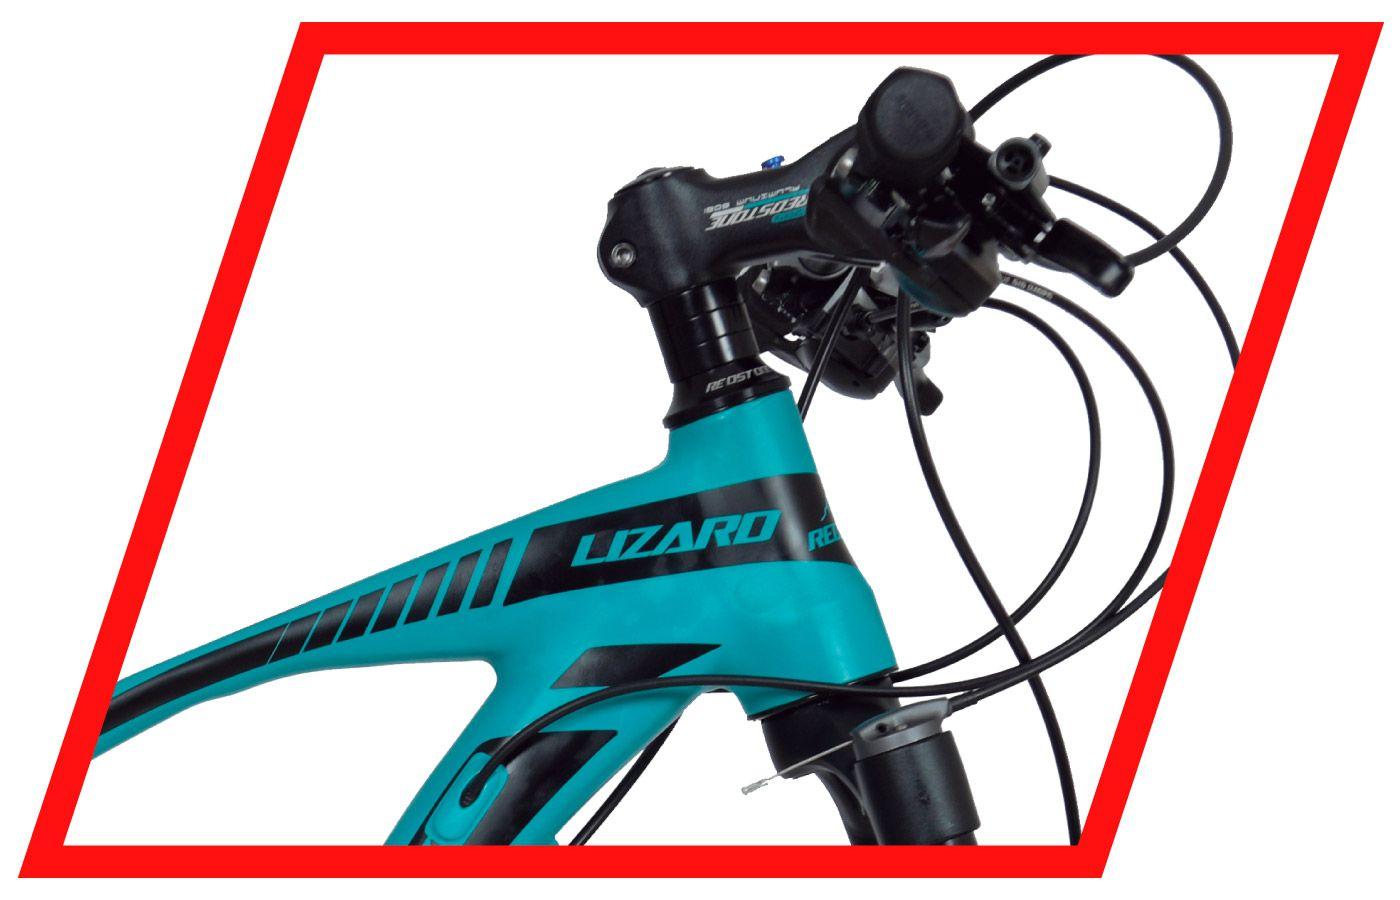 Bicicleta Mountain Bike Redstone Lizard 2 x 9